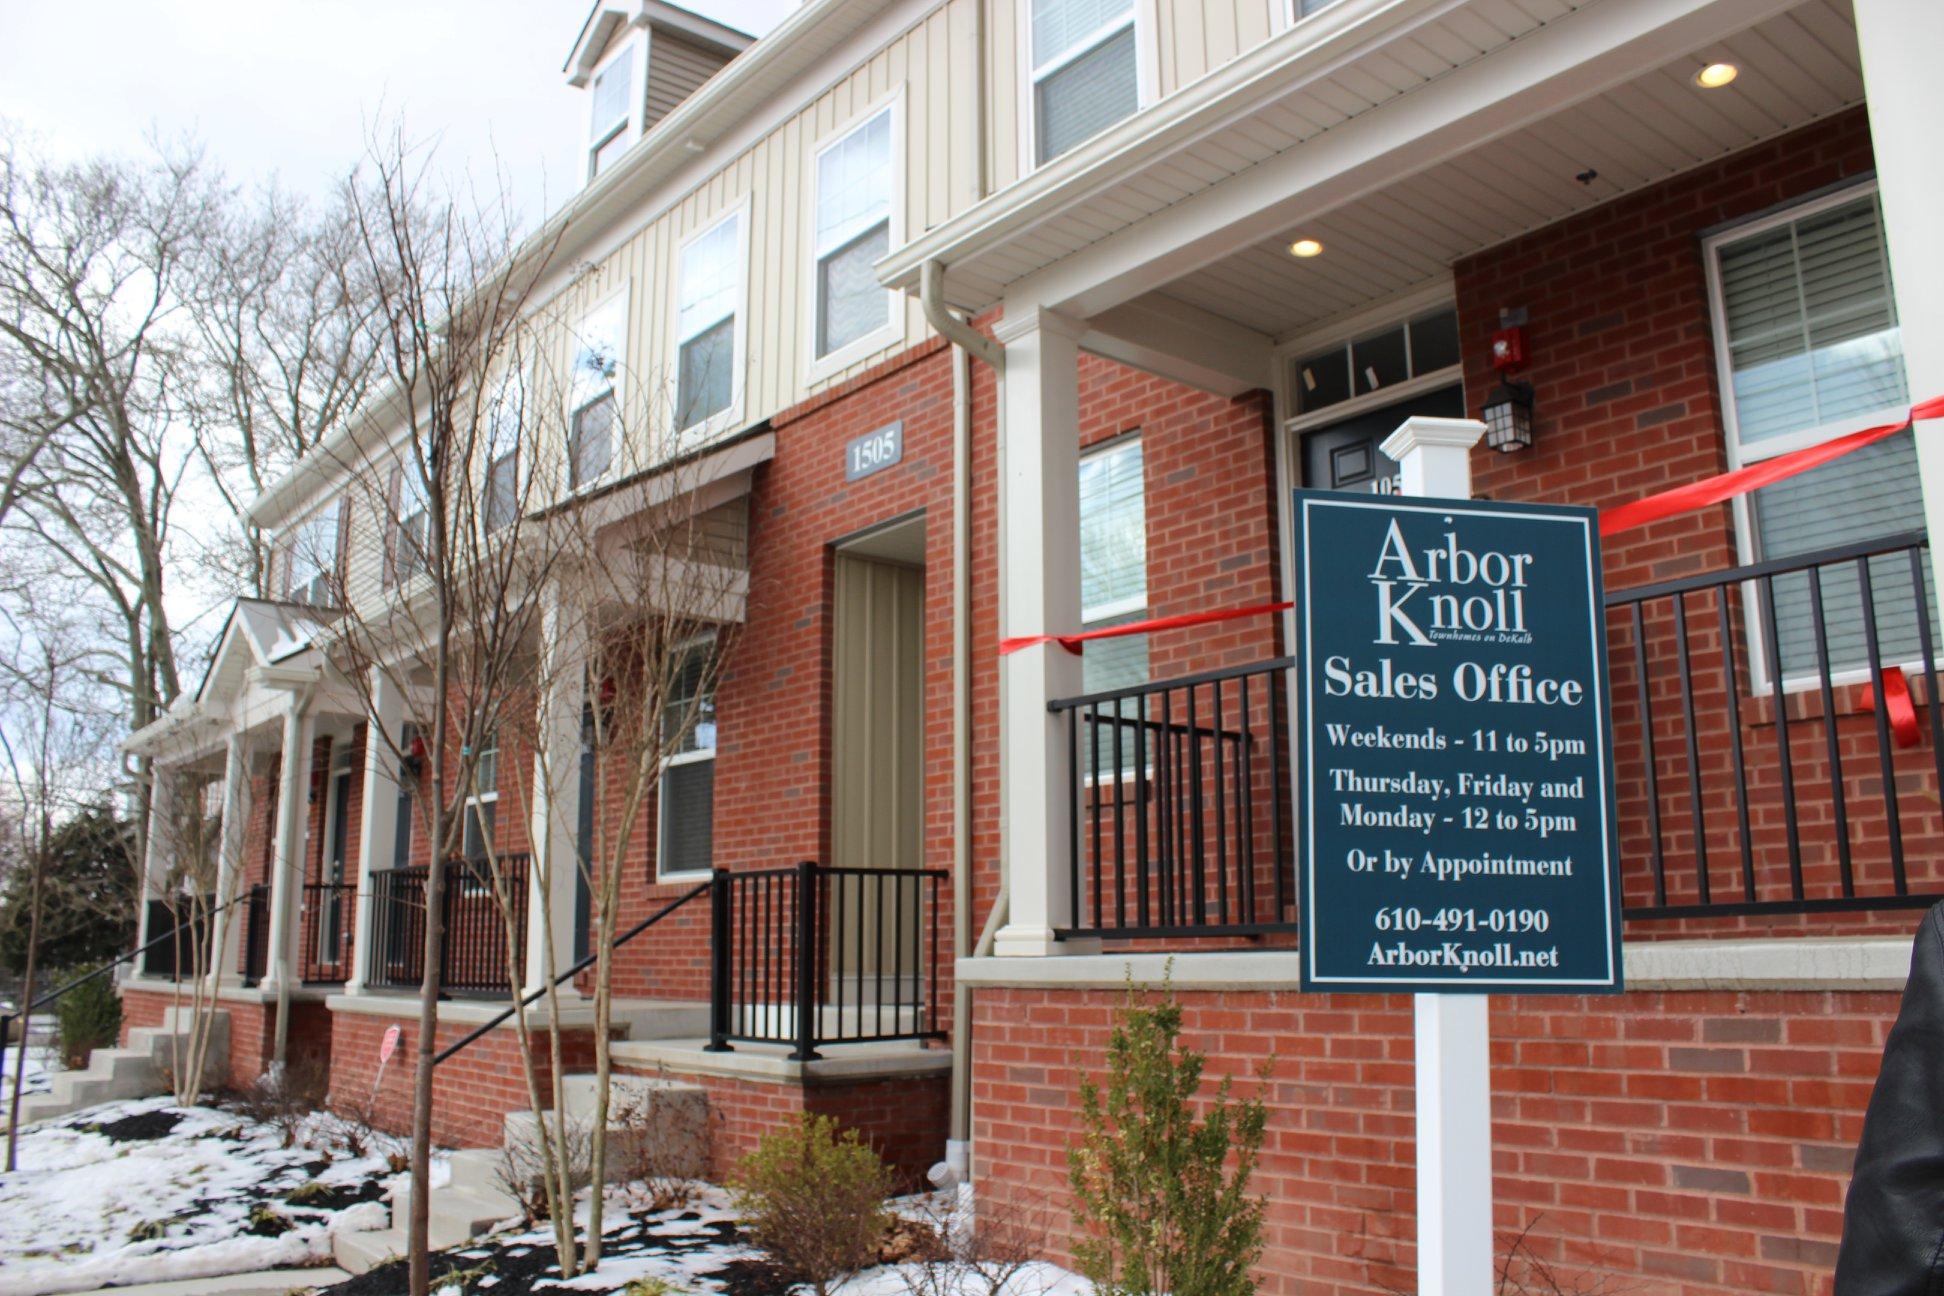 Reclaiming Norristown's elegant past